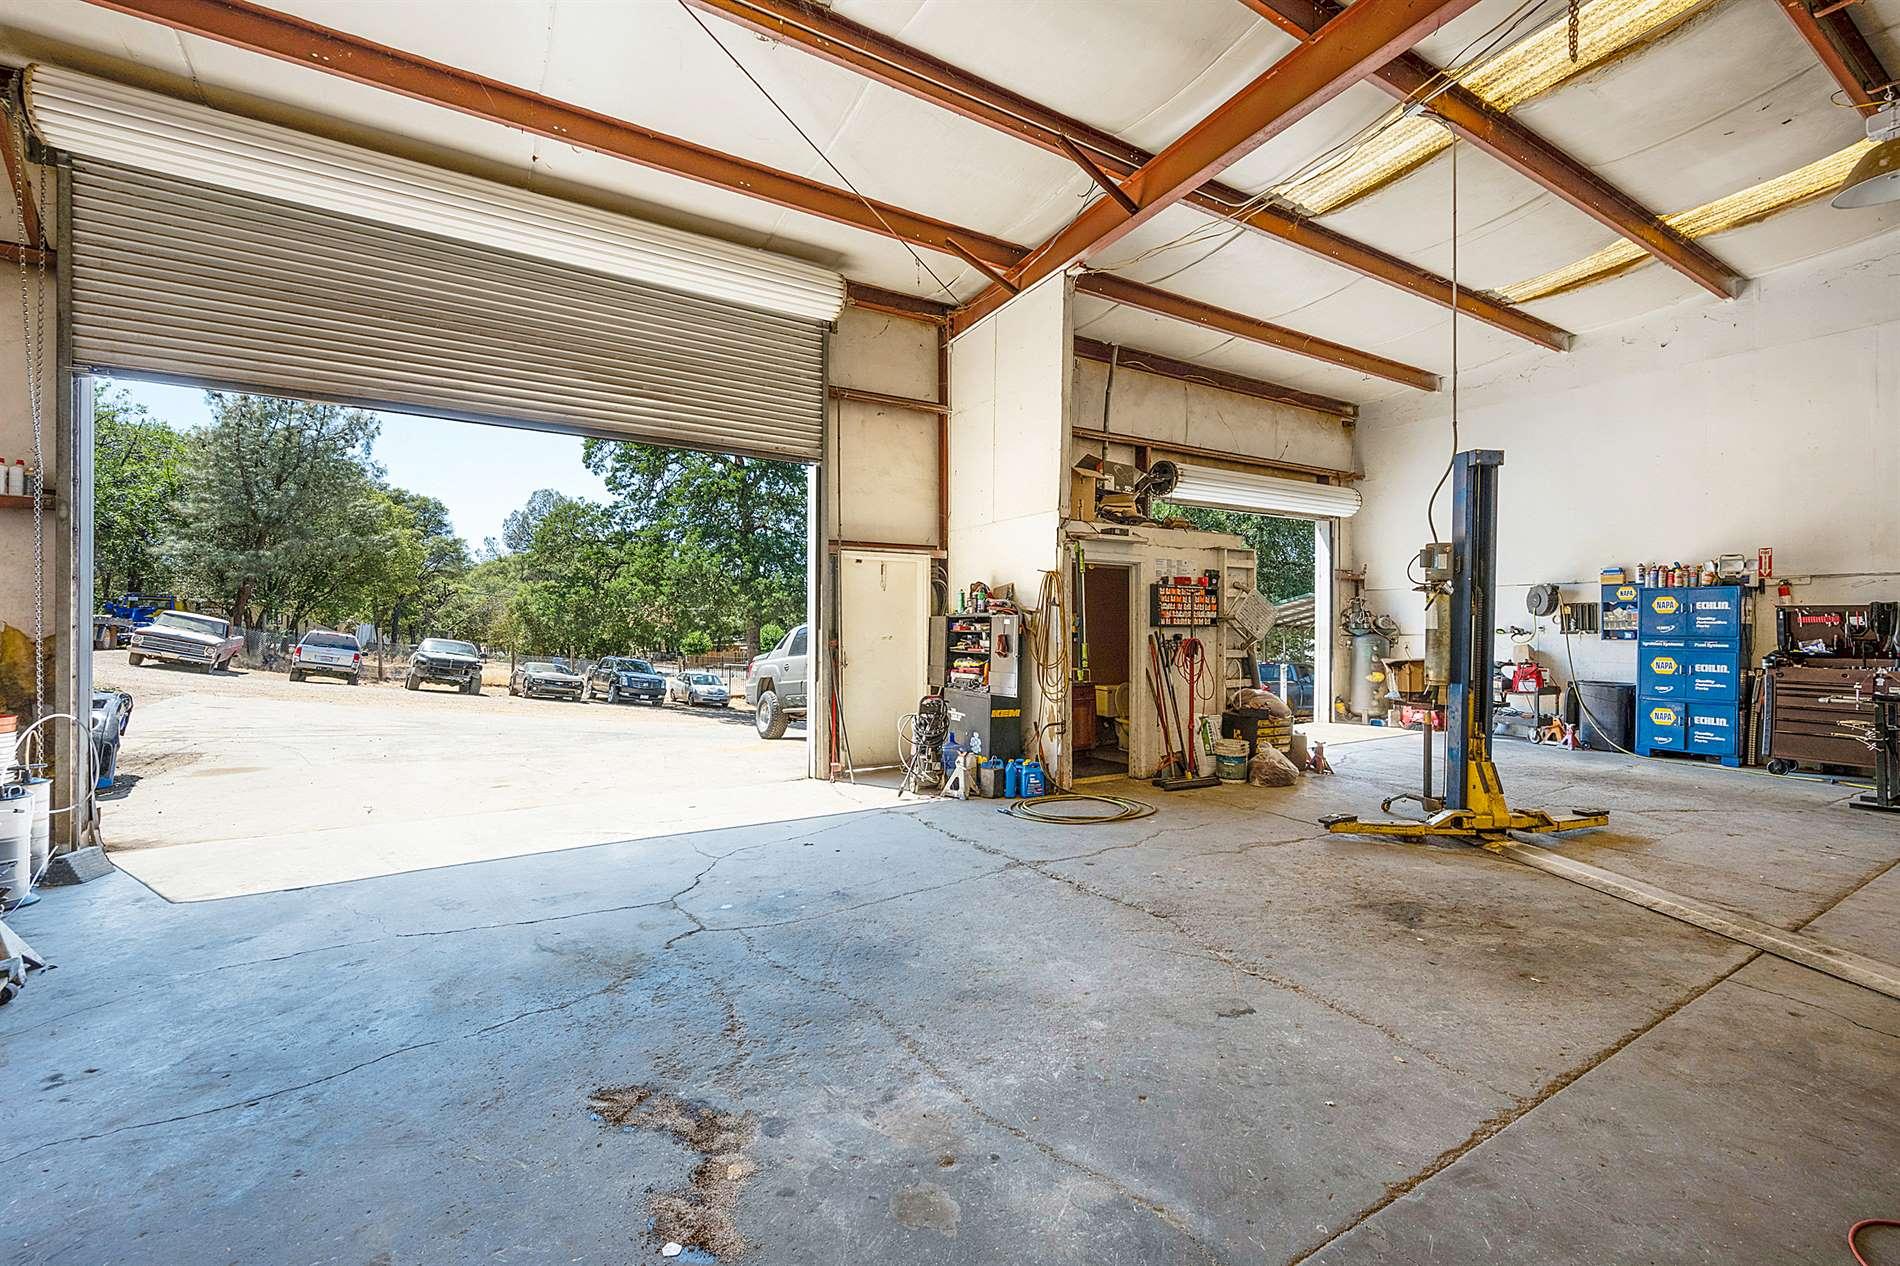 3400 B Garfield Ave, Clearlake, CA 95422